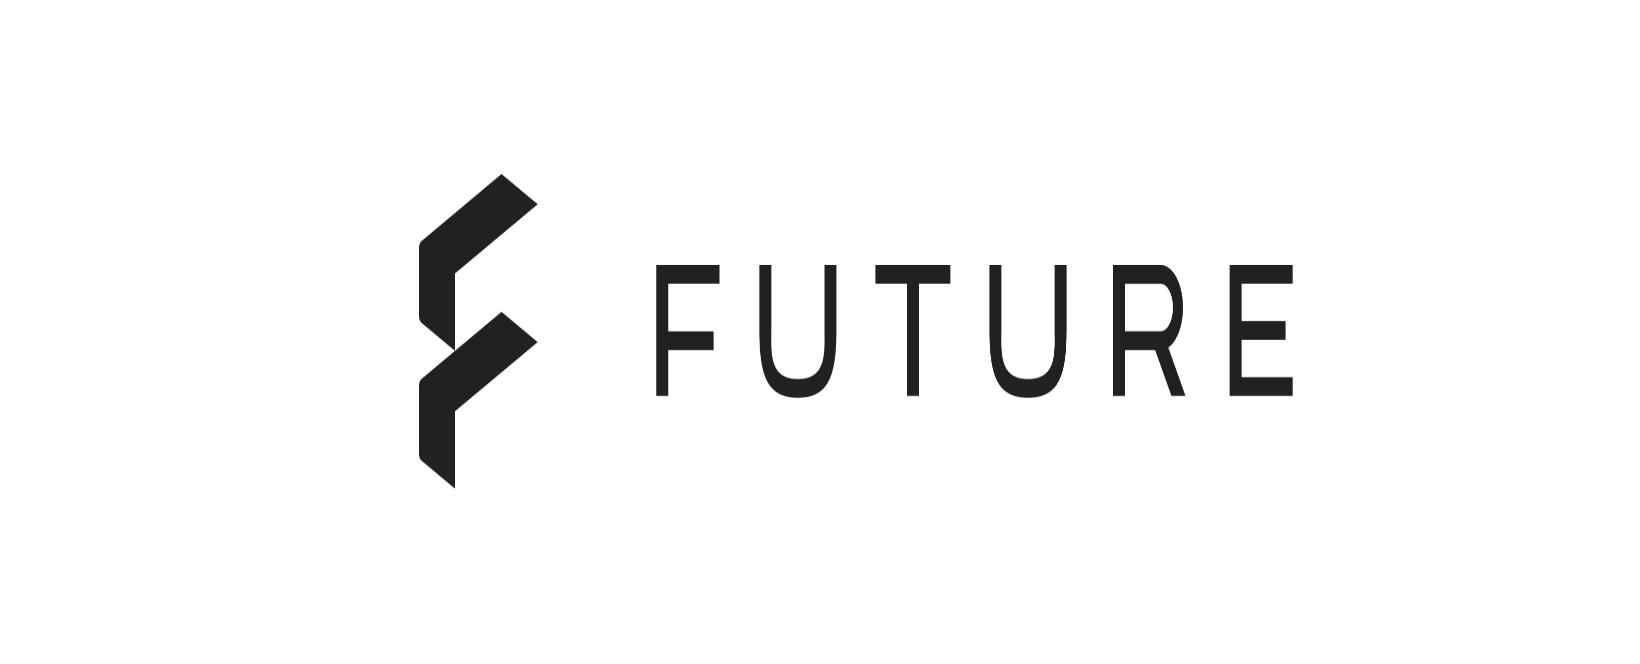 Future Fitness Discount Code 2021